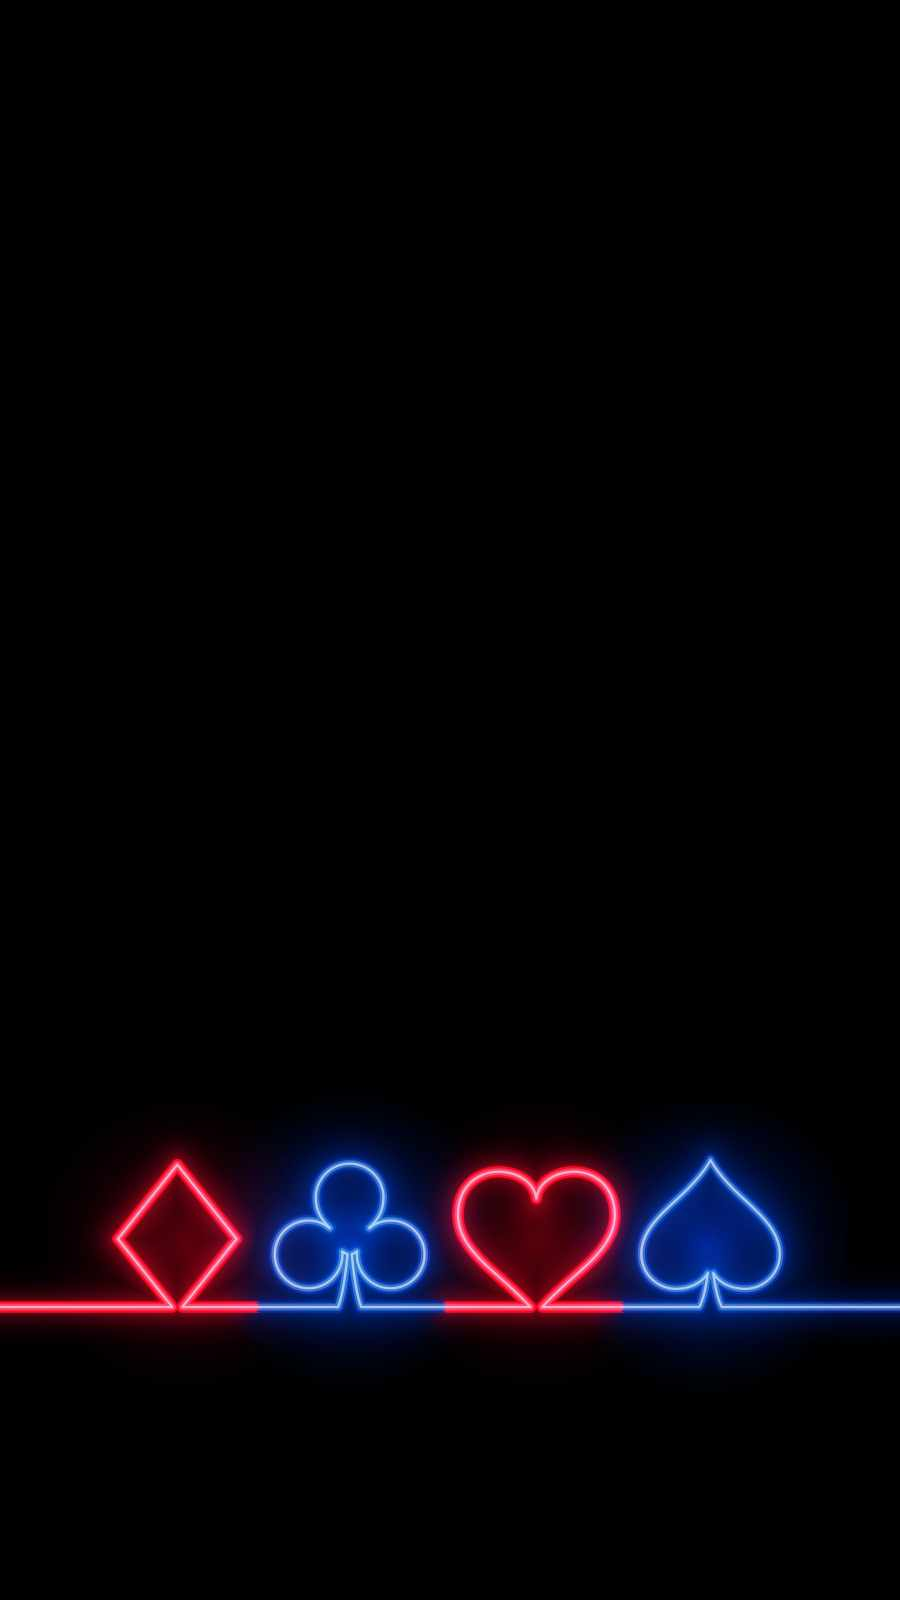 Poker Symbols Neon